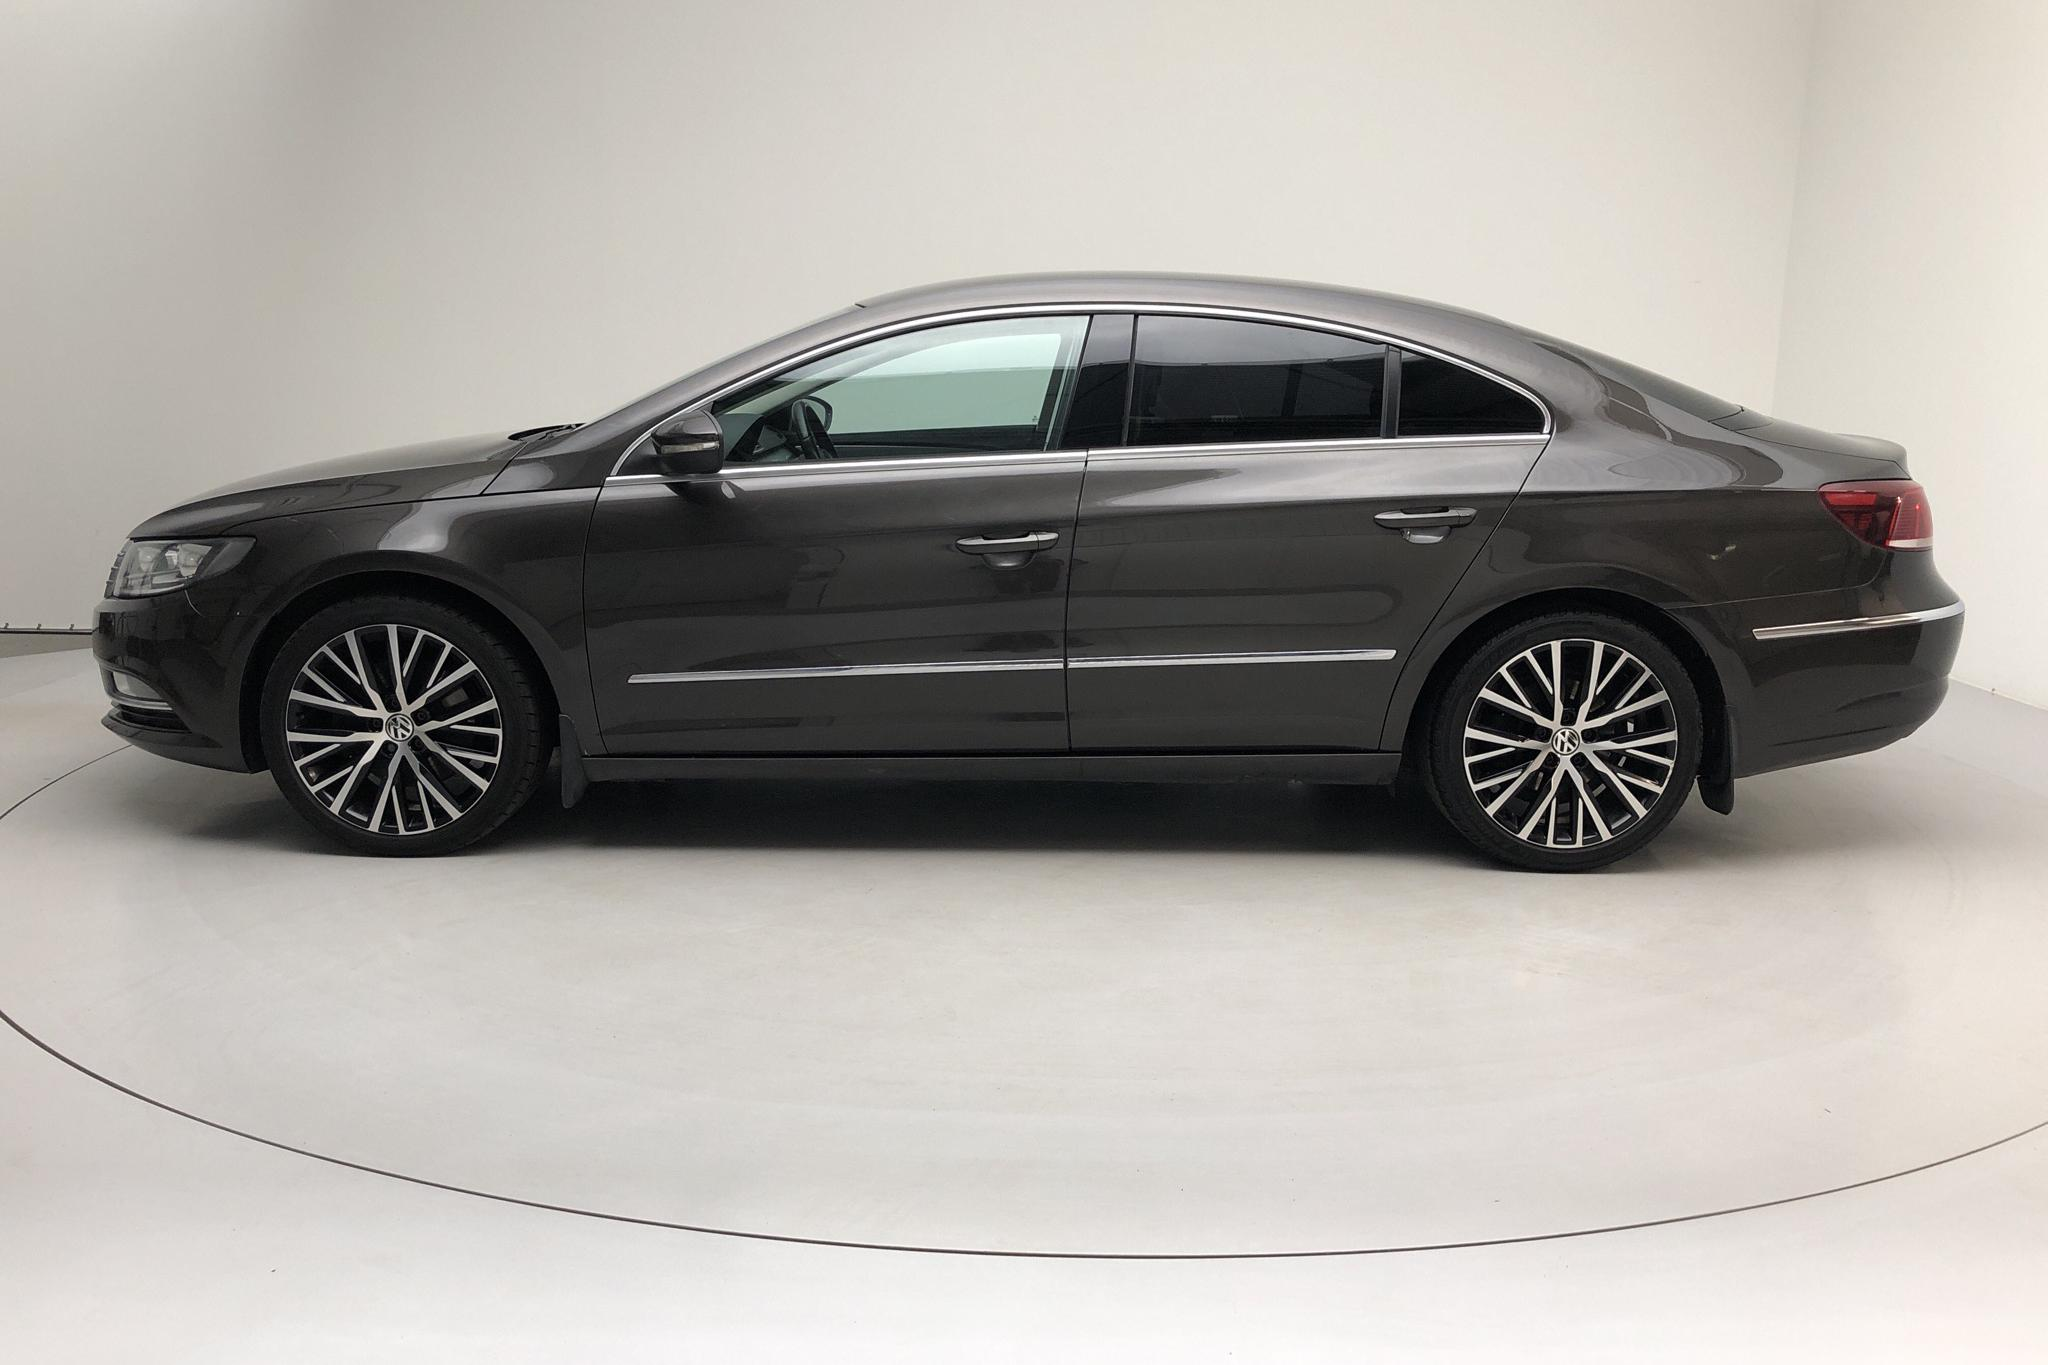 VW CC 2.0 TDI BlueMotion Technology (170hk) - 186 010 km - Automatic - Dark Brown - 2012